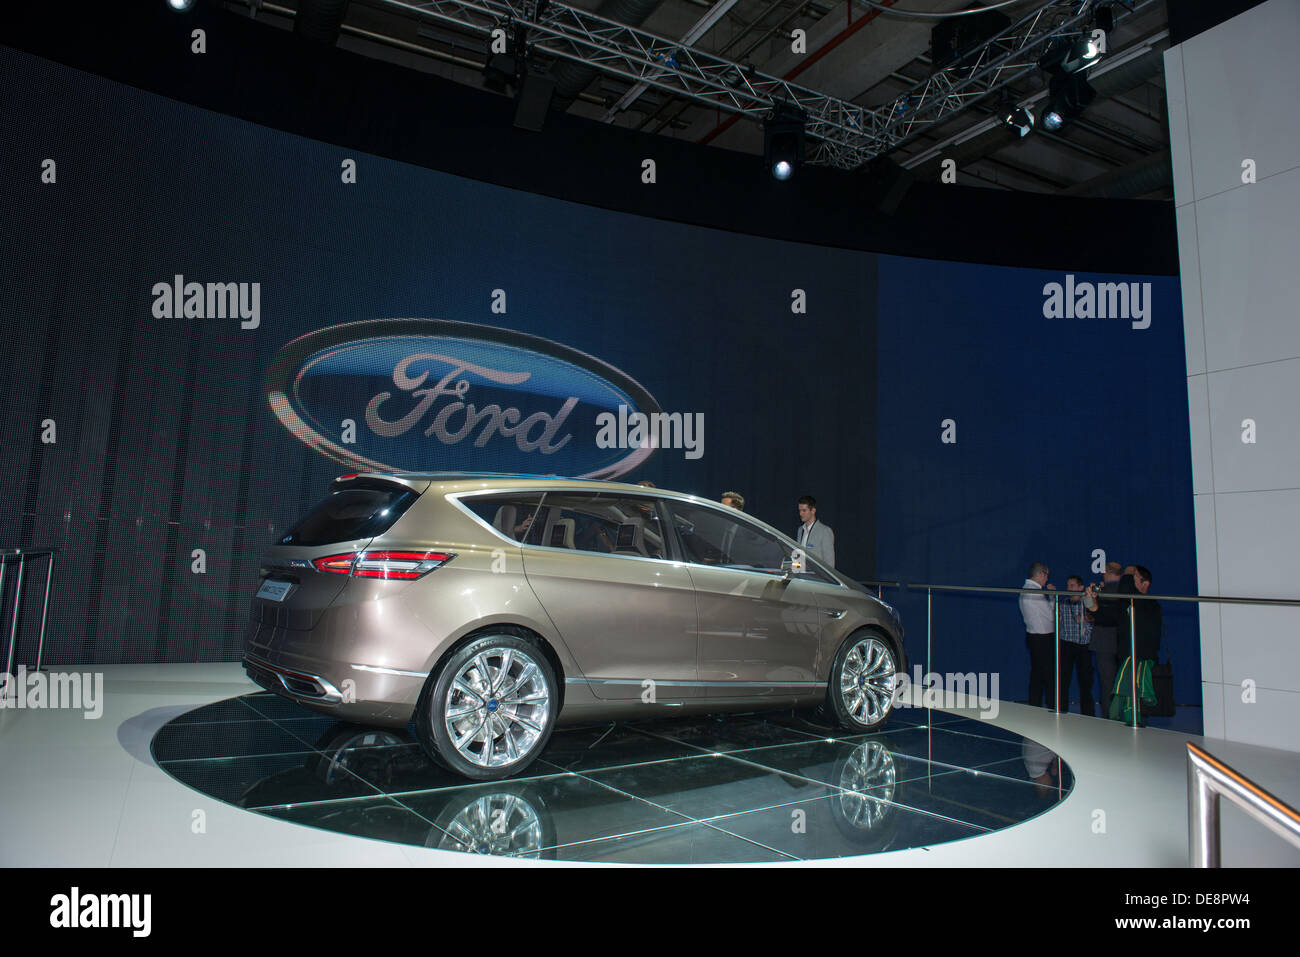 Frankfurt, Germany. 11th Sep, 2013. : Frankfurt international motor show (IAA) 2013. Ford S-MAX Concept - world premiere © Alexey Zarubin/Alamy Live News - Stock Image